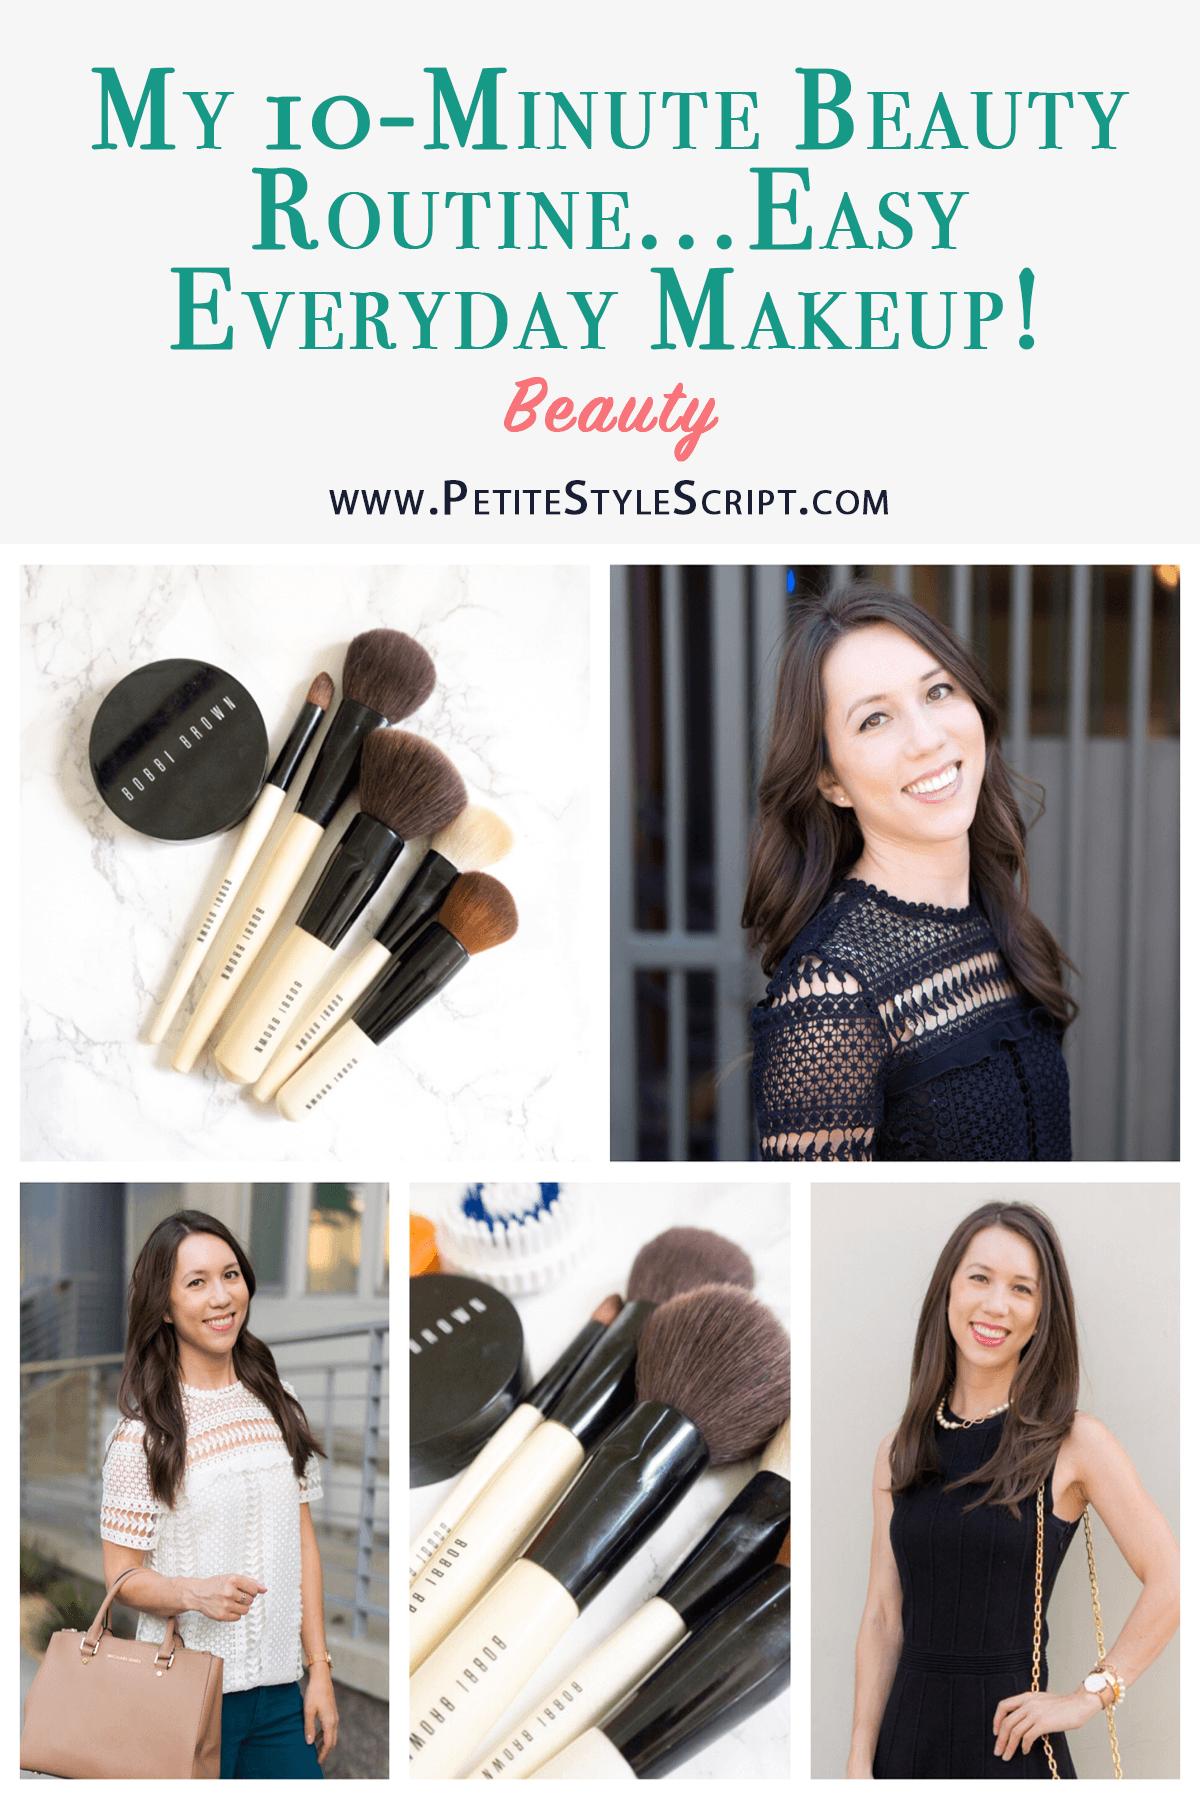 My 10-Minute Beauty Routine + Sephora Beauty Insider Sale